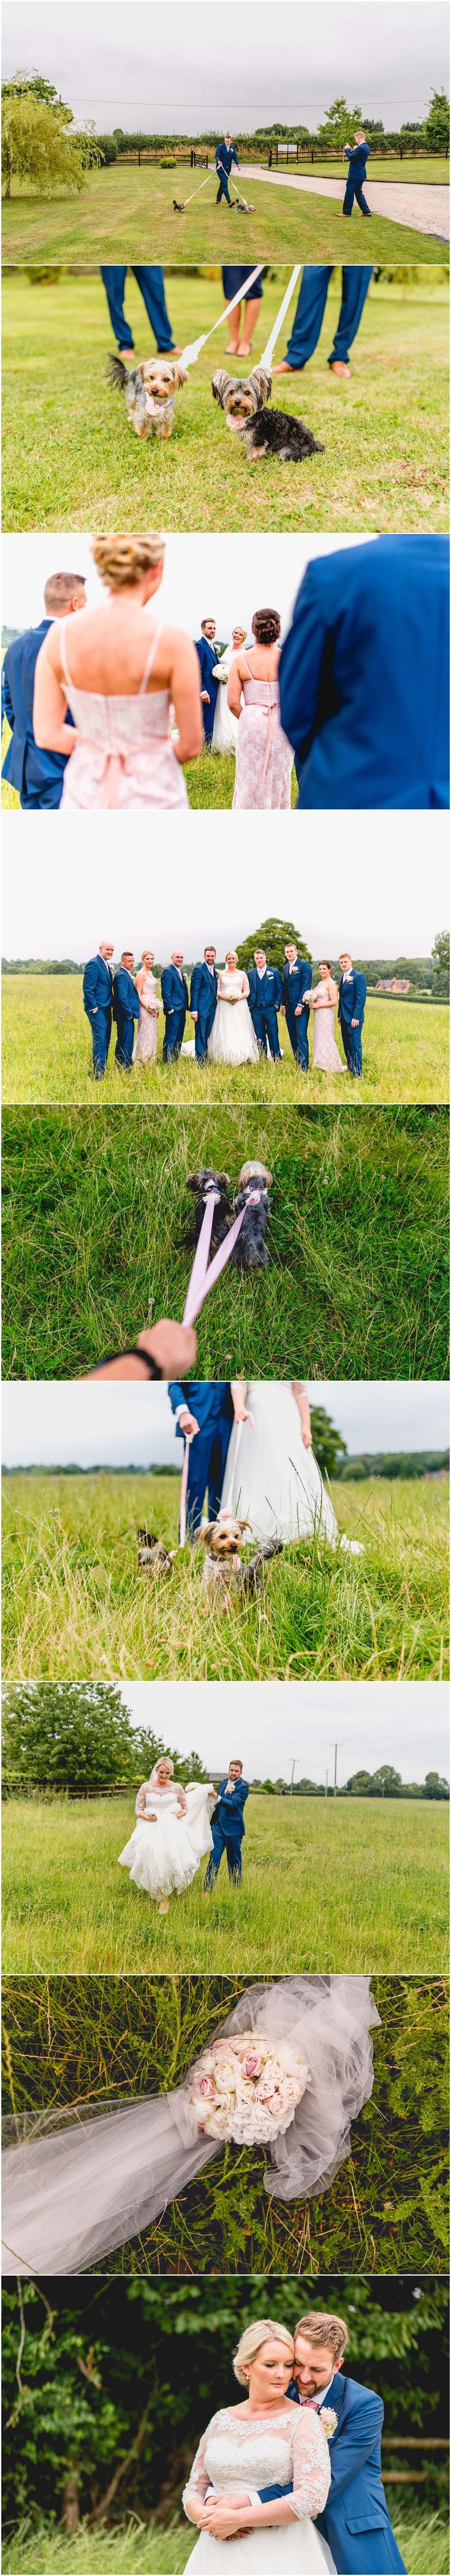 Curradine Barns Wedding Photos by Lisa Carpenter